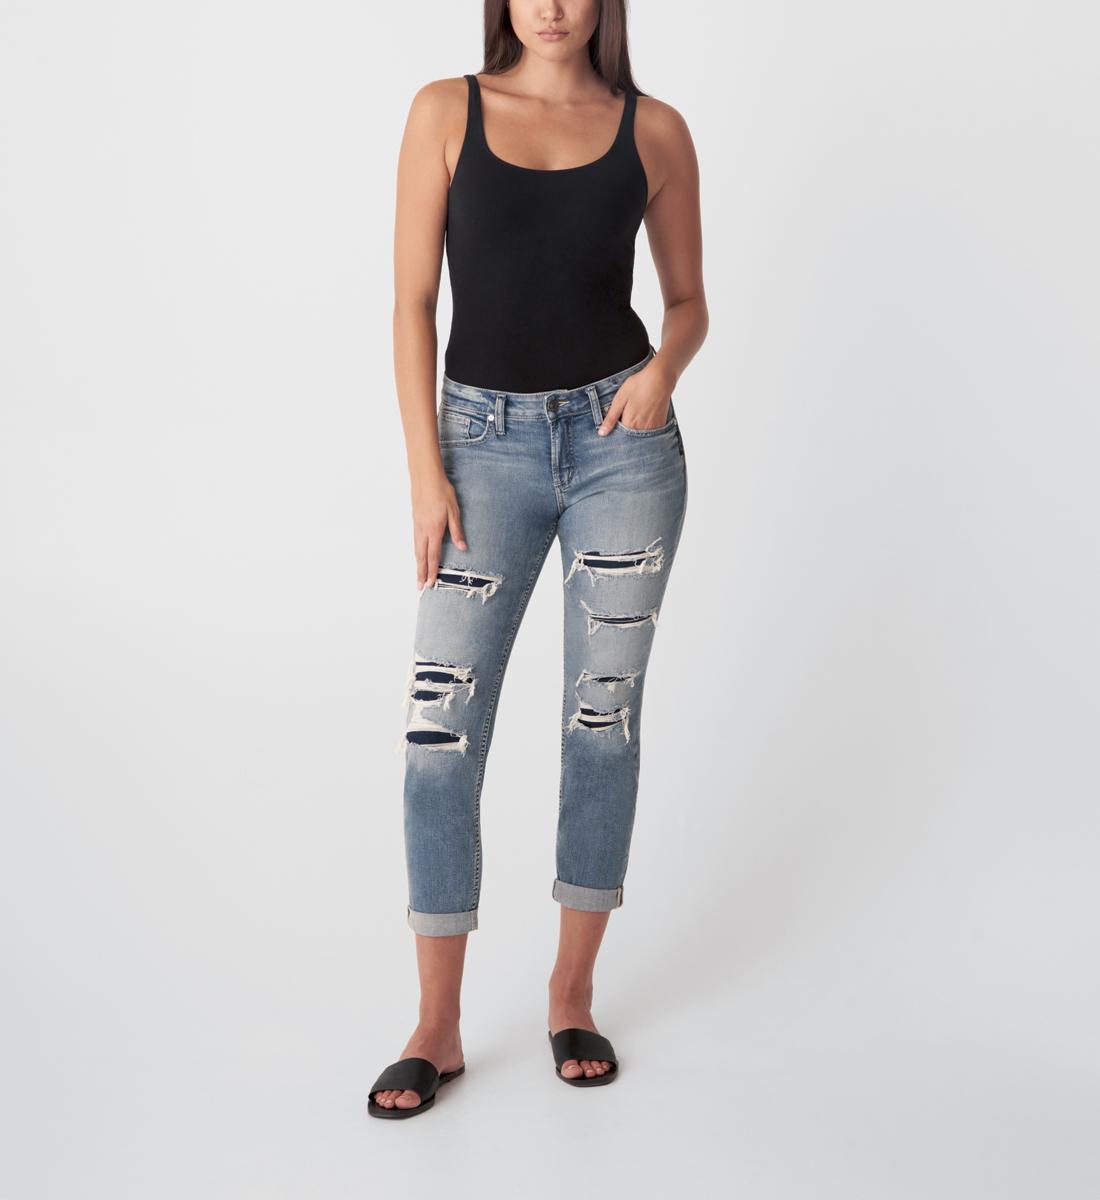 Silver Jeans Boyfriend Mid Rise Slim Leg Jeans